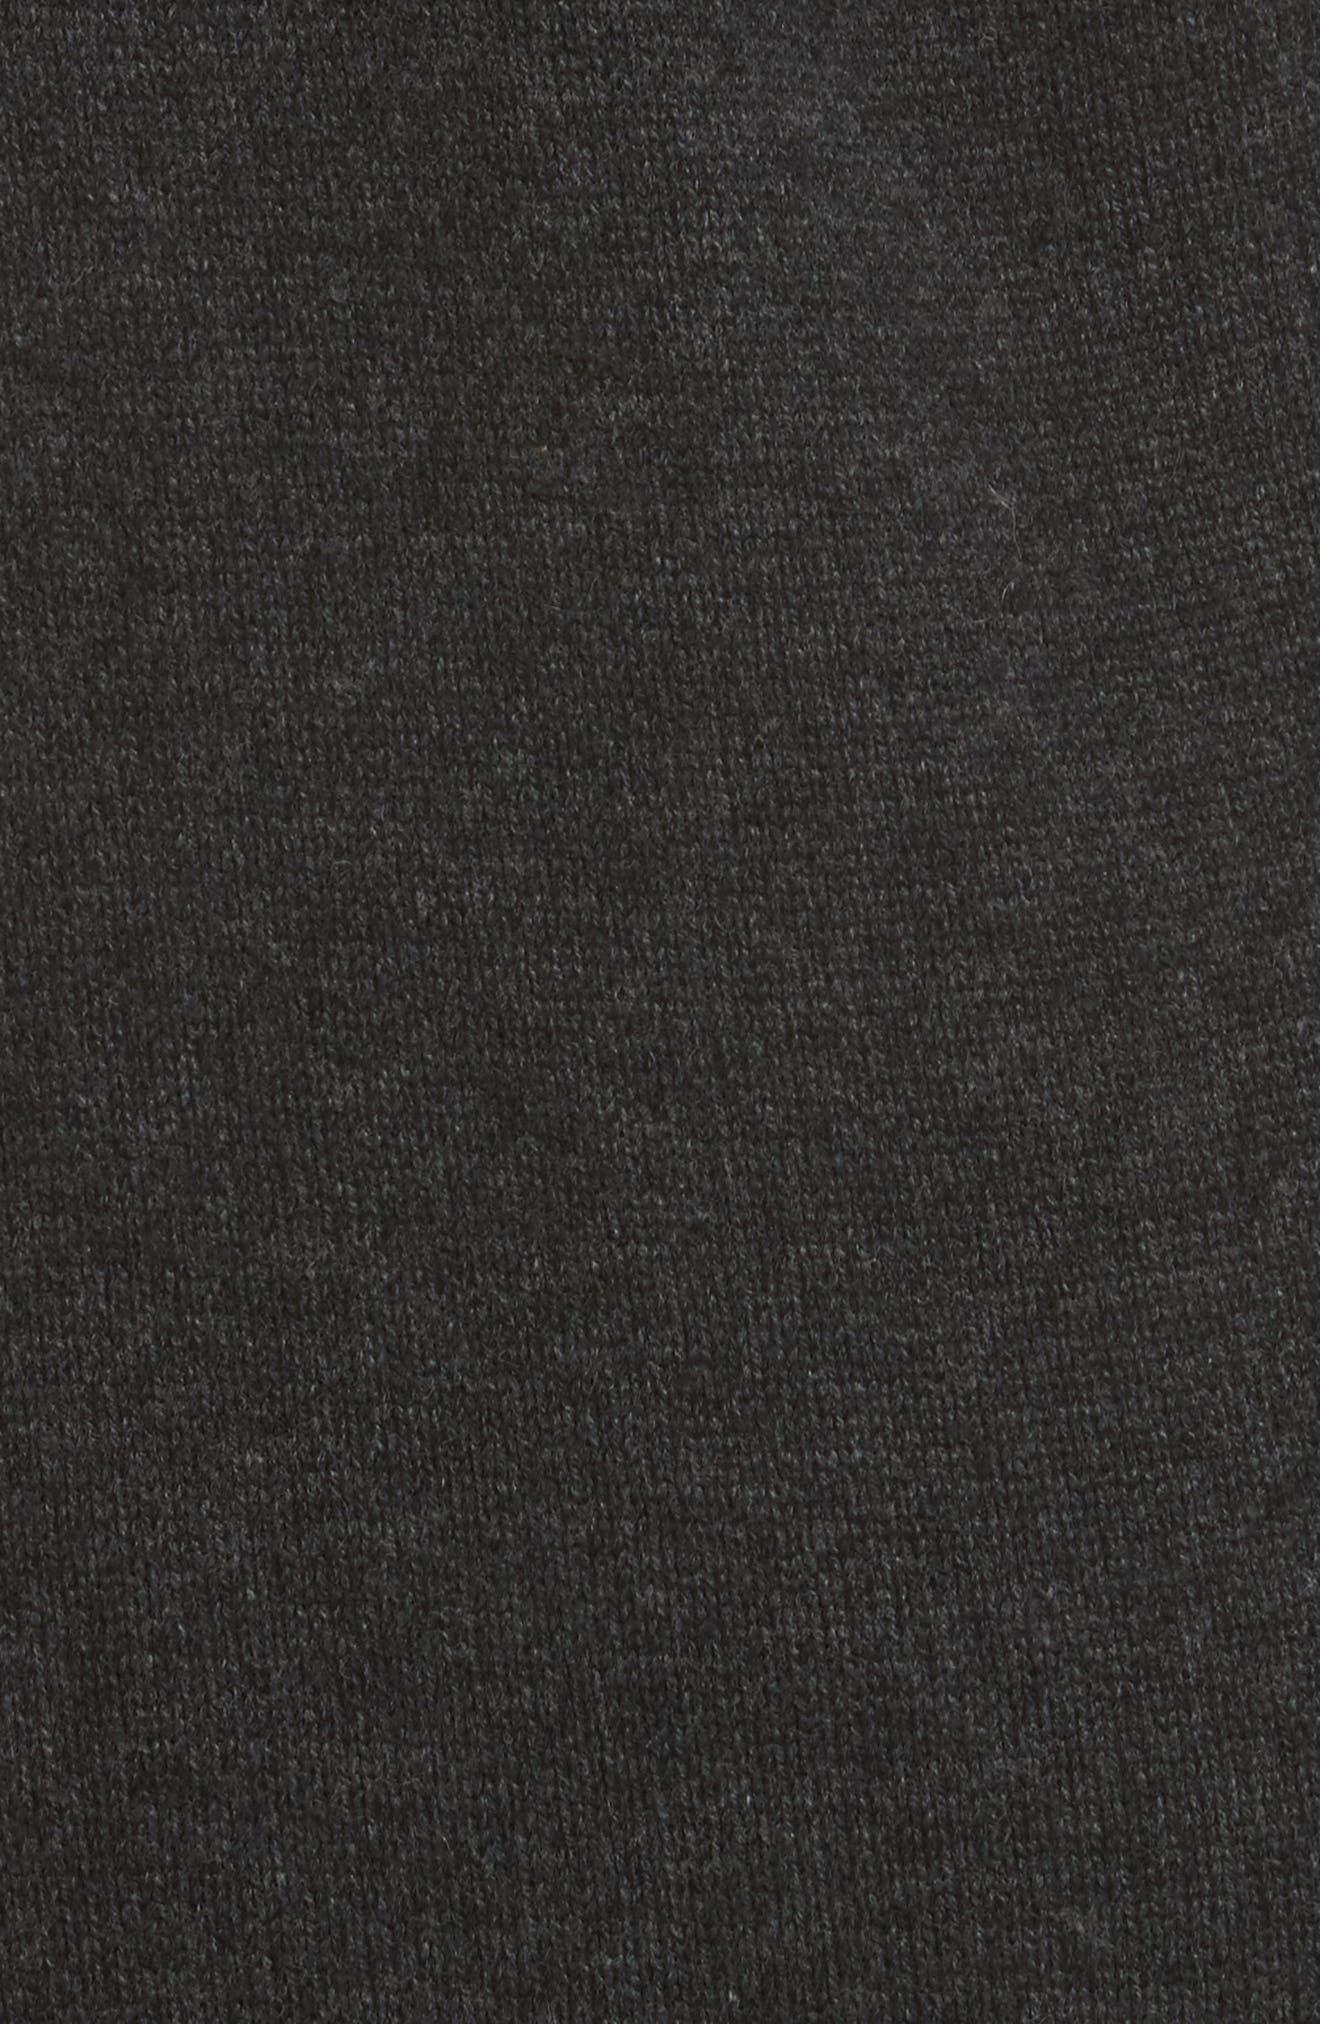 One-Shoulder Sweater Dress,                             Alternate thumbnail 5, color,                             009